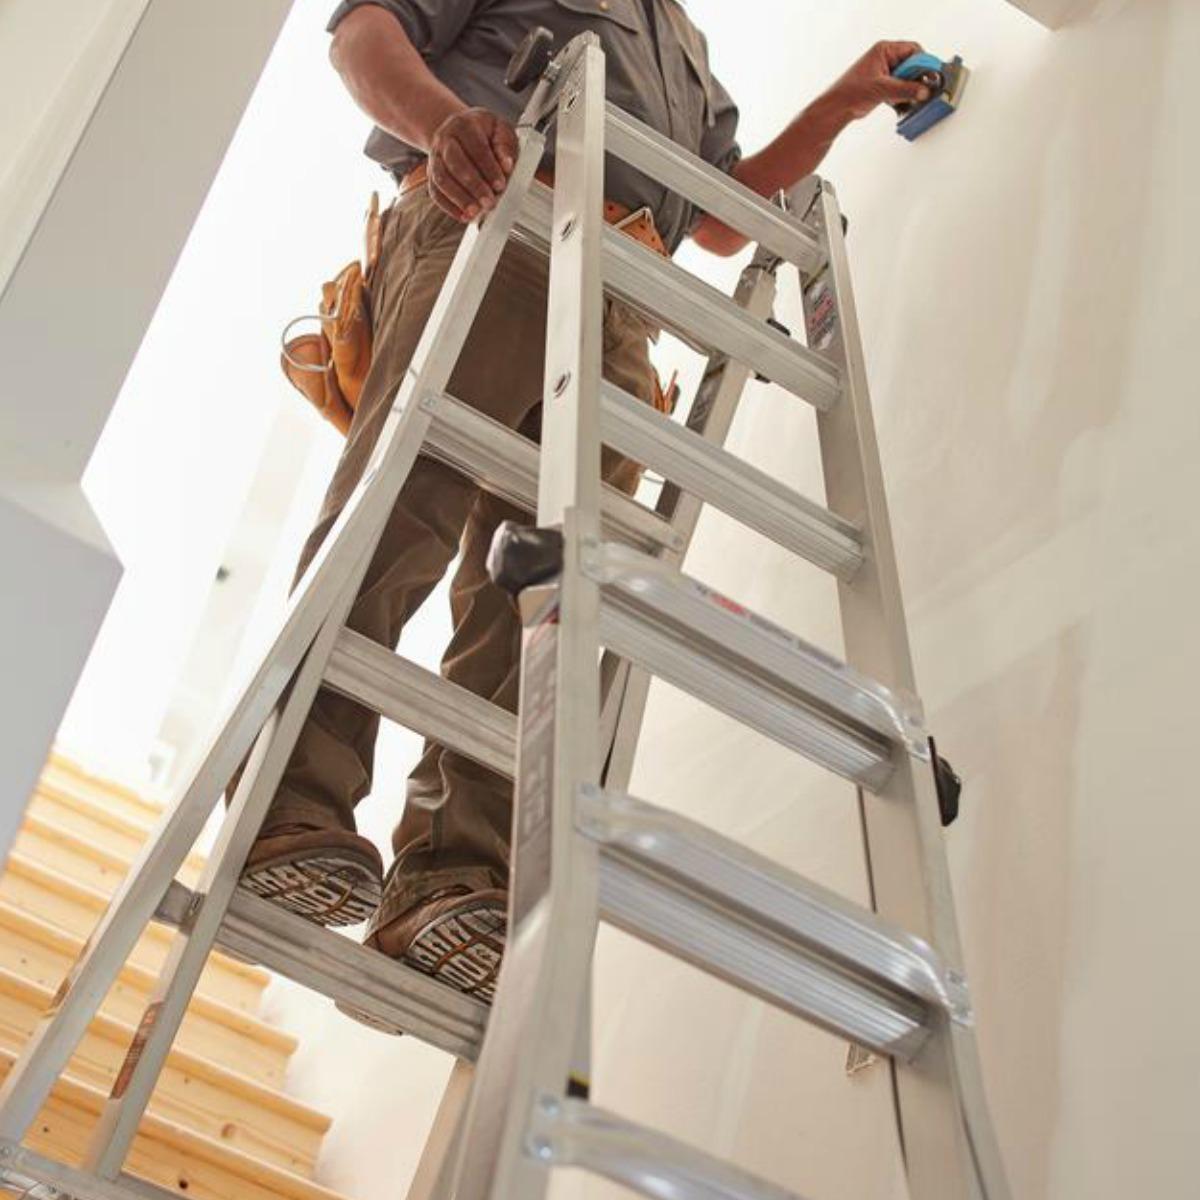 Gorilla 18 Ladder Only 89 88 On Home Depot Regularly 159